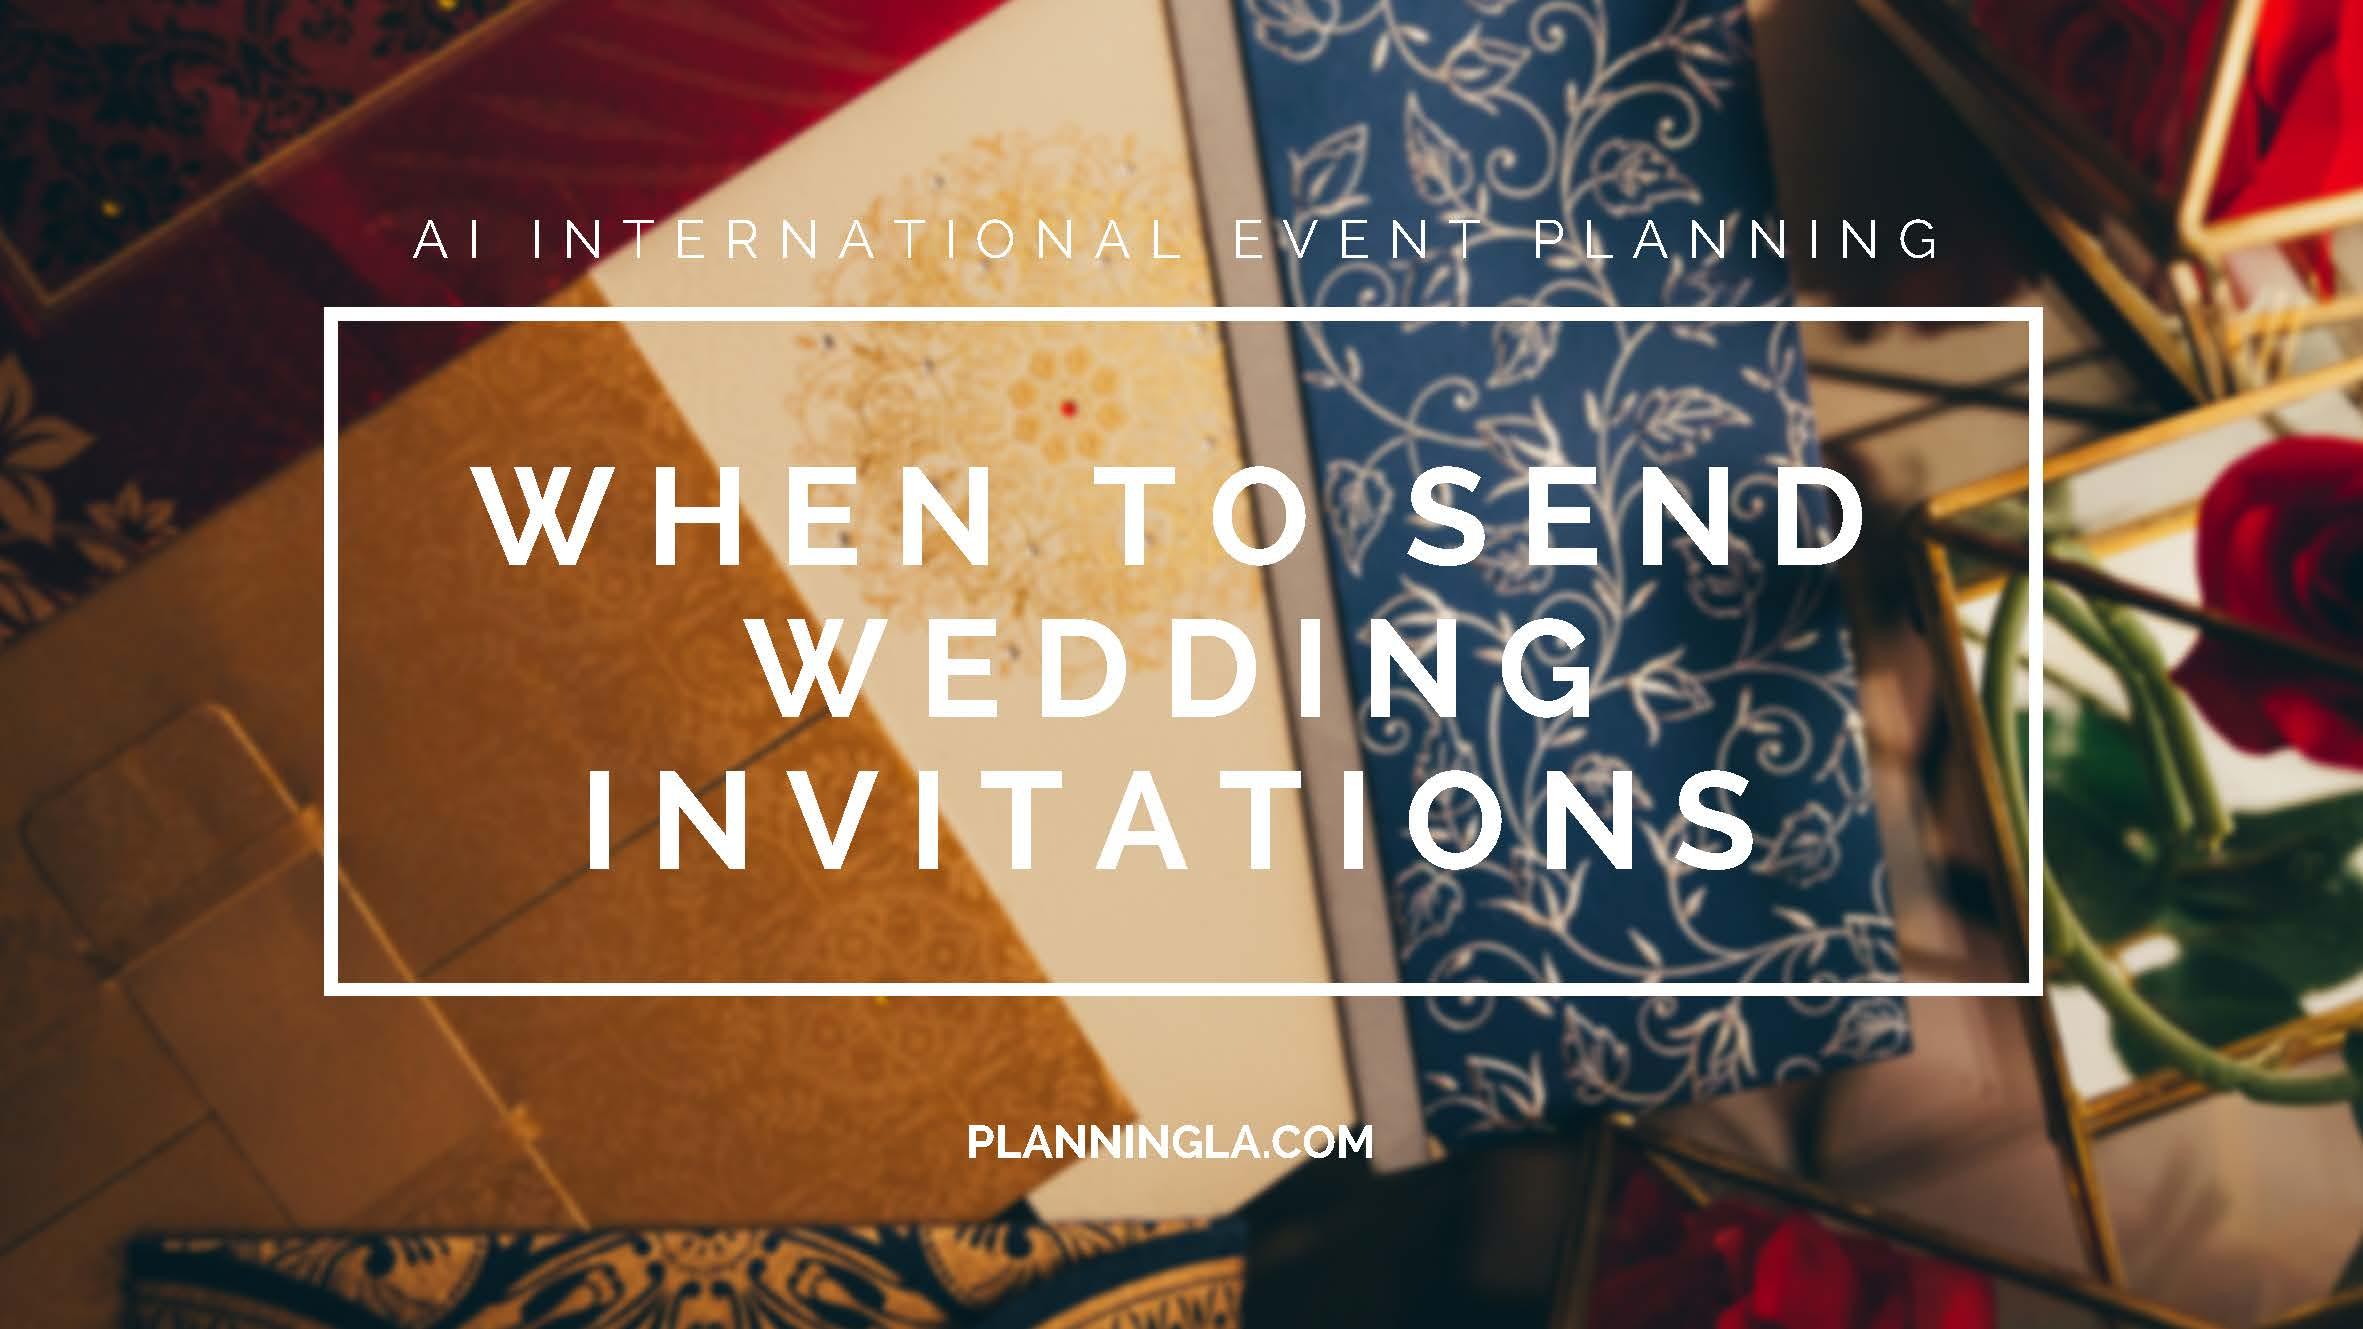 When To Send Wedding Invitations | A Beverly Hills Event Planner | Ai International Event Planner.jpg